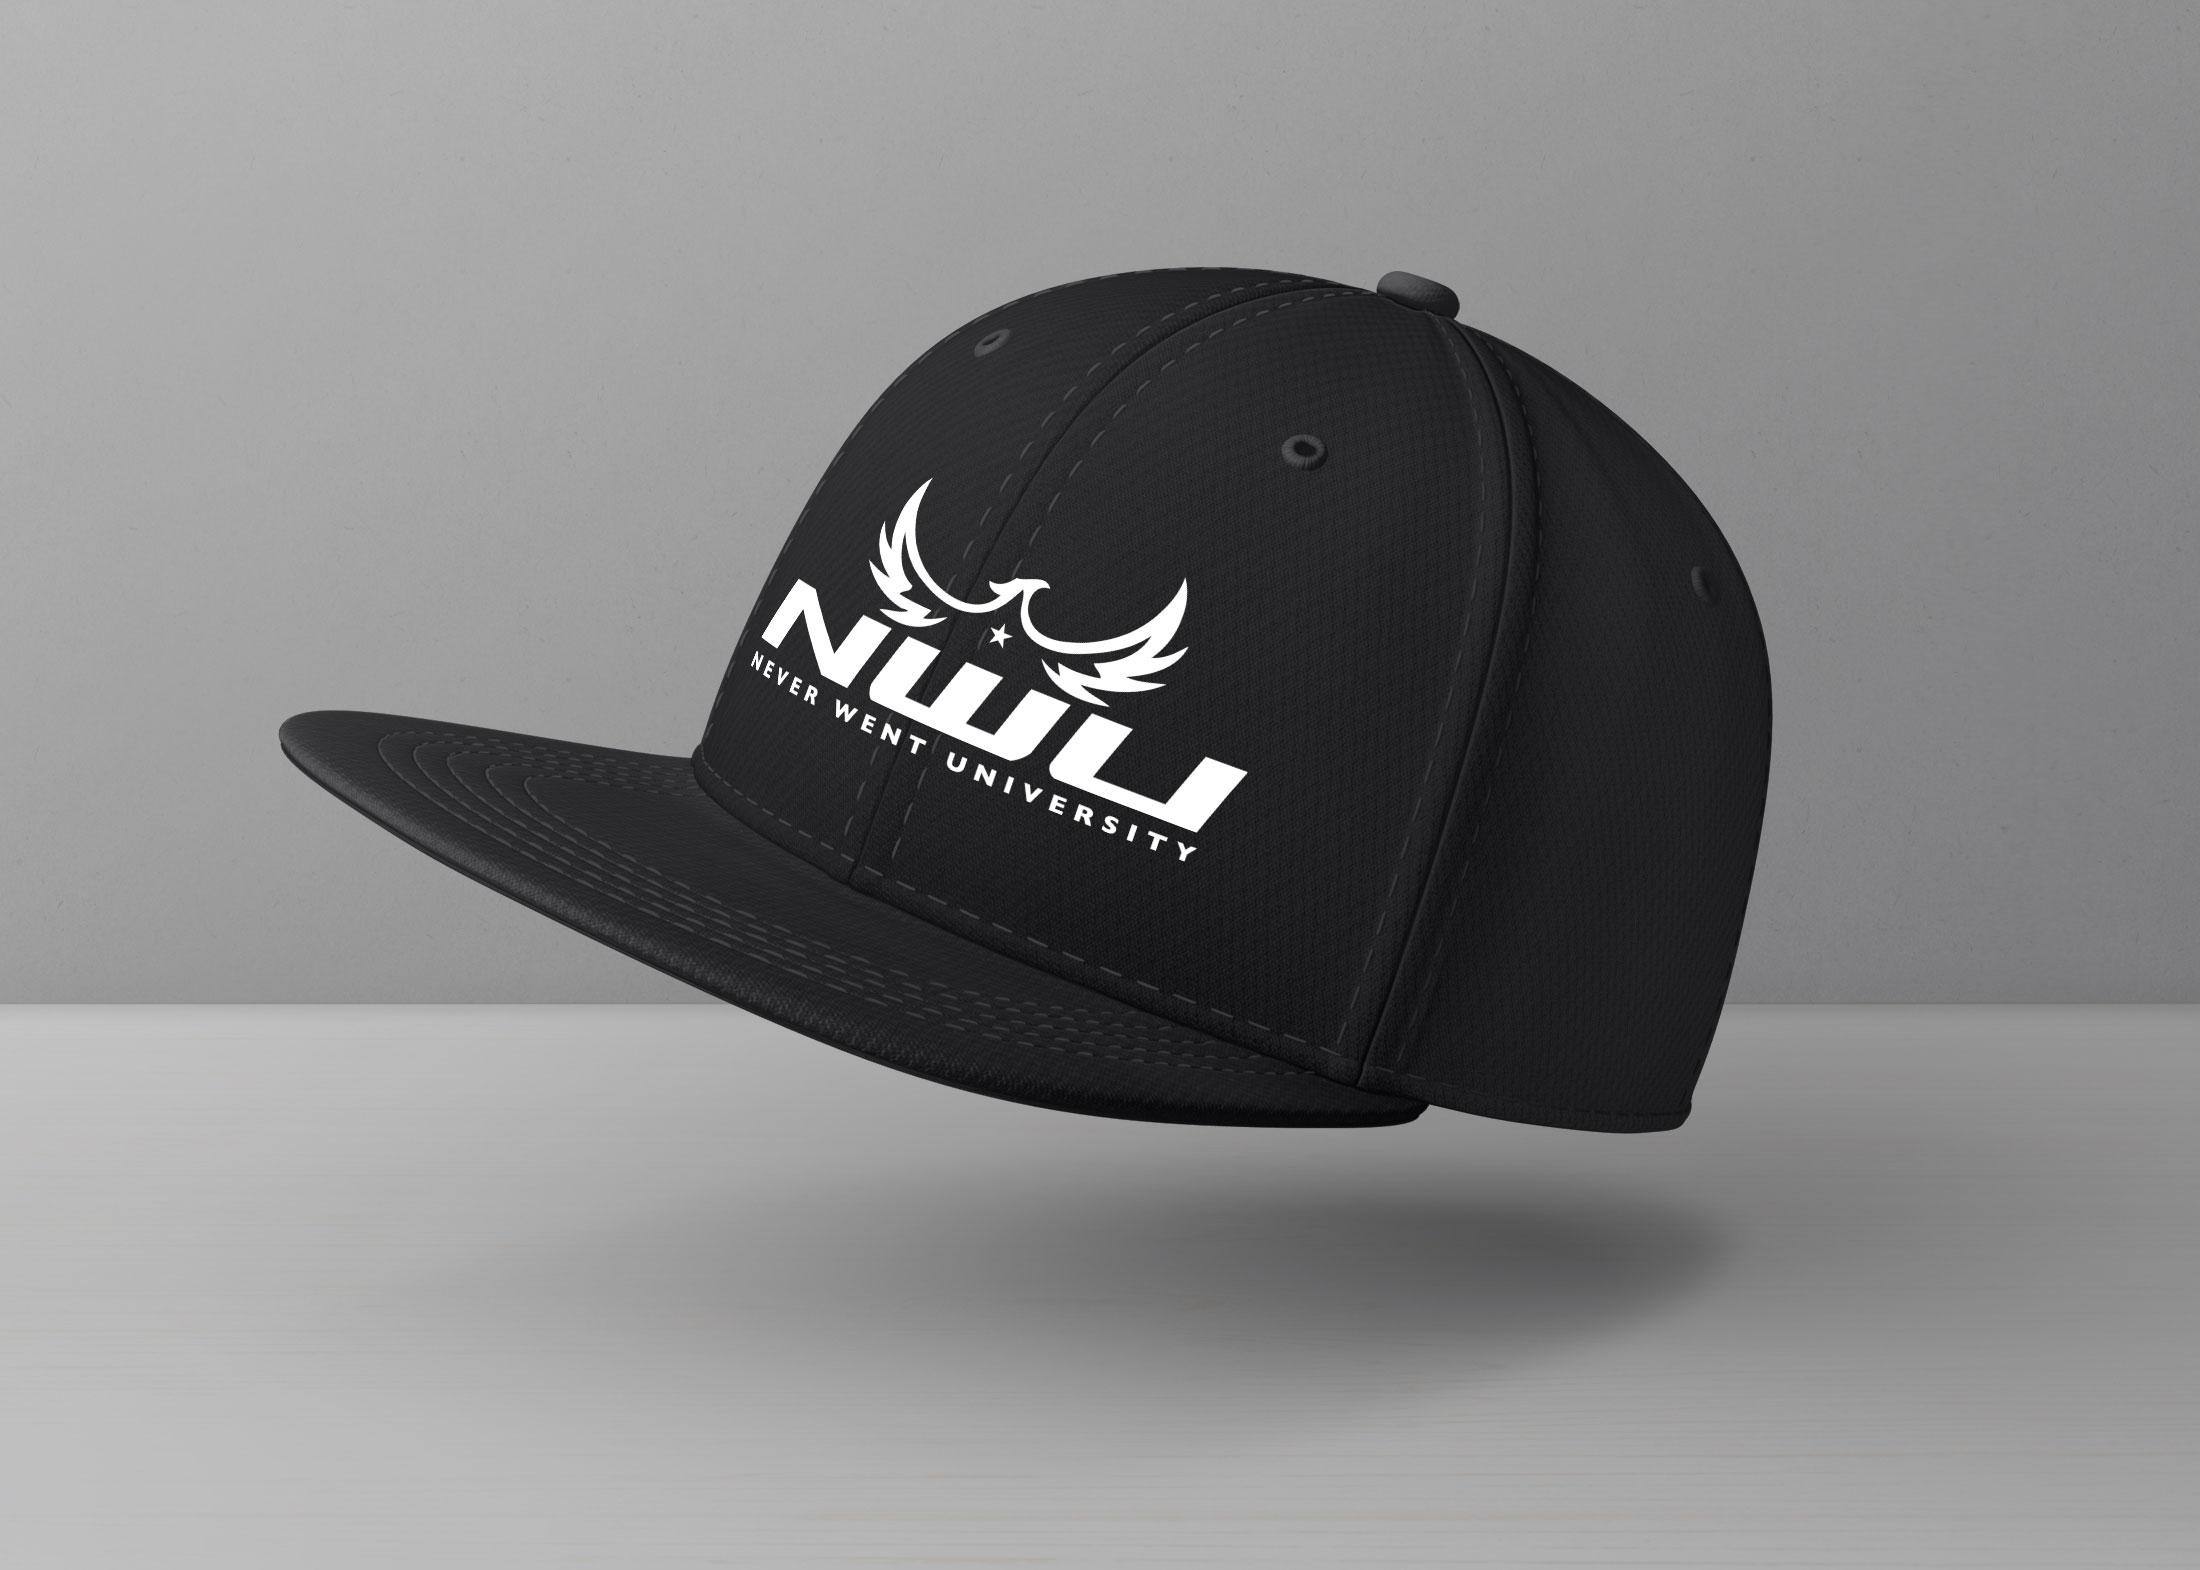 NWU-Portfolio-Hat-2200×1570